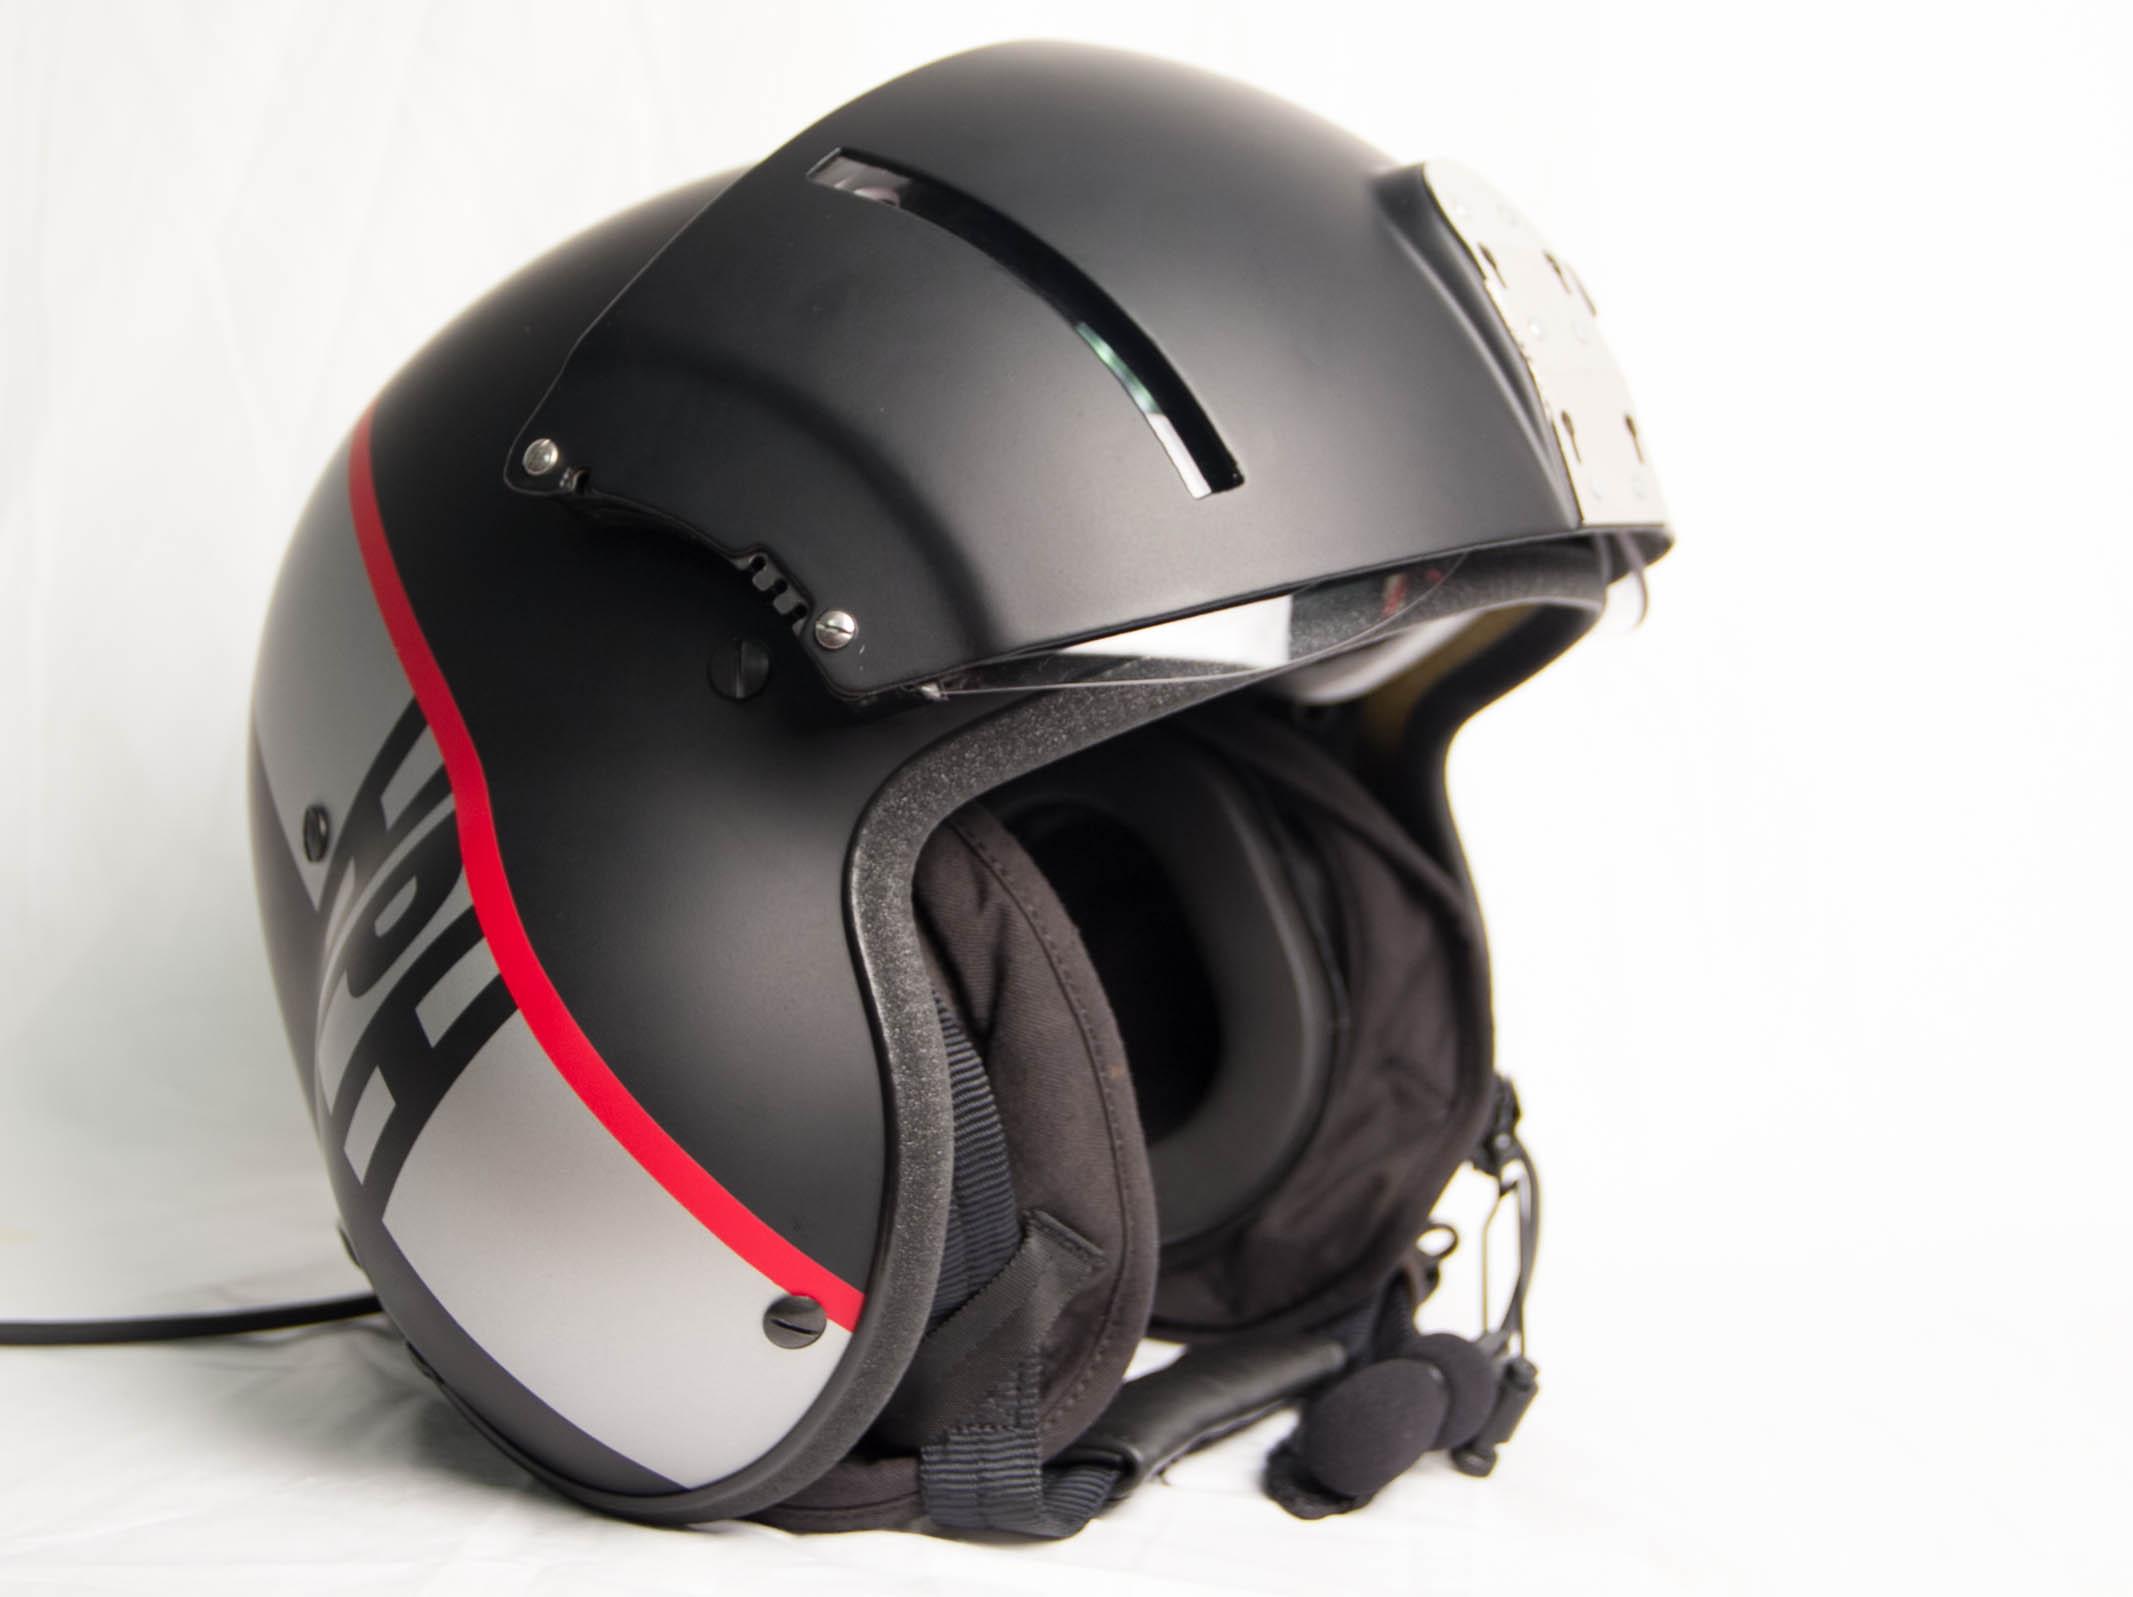 Lightweight Motorcycle Helmet >> Evo Kevlar Helicopter Helmets For Sale Online Evo Hph For Sale